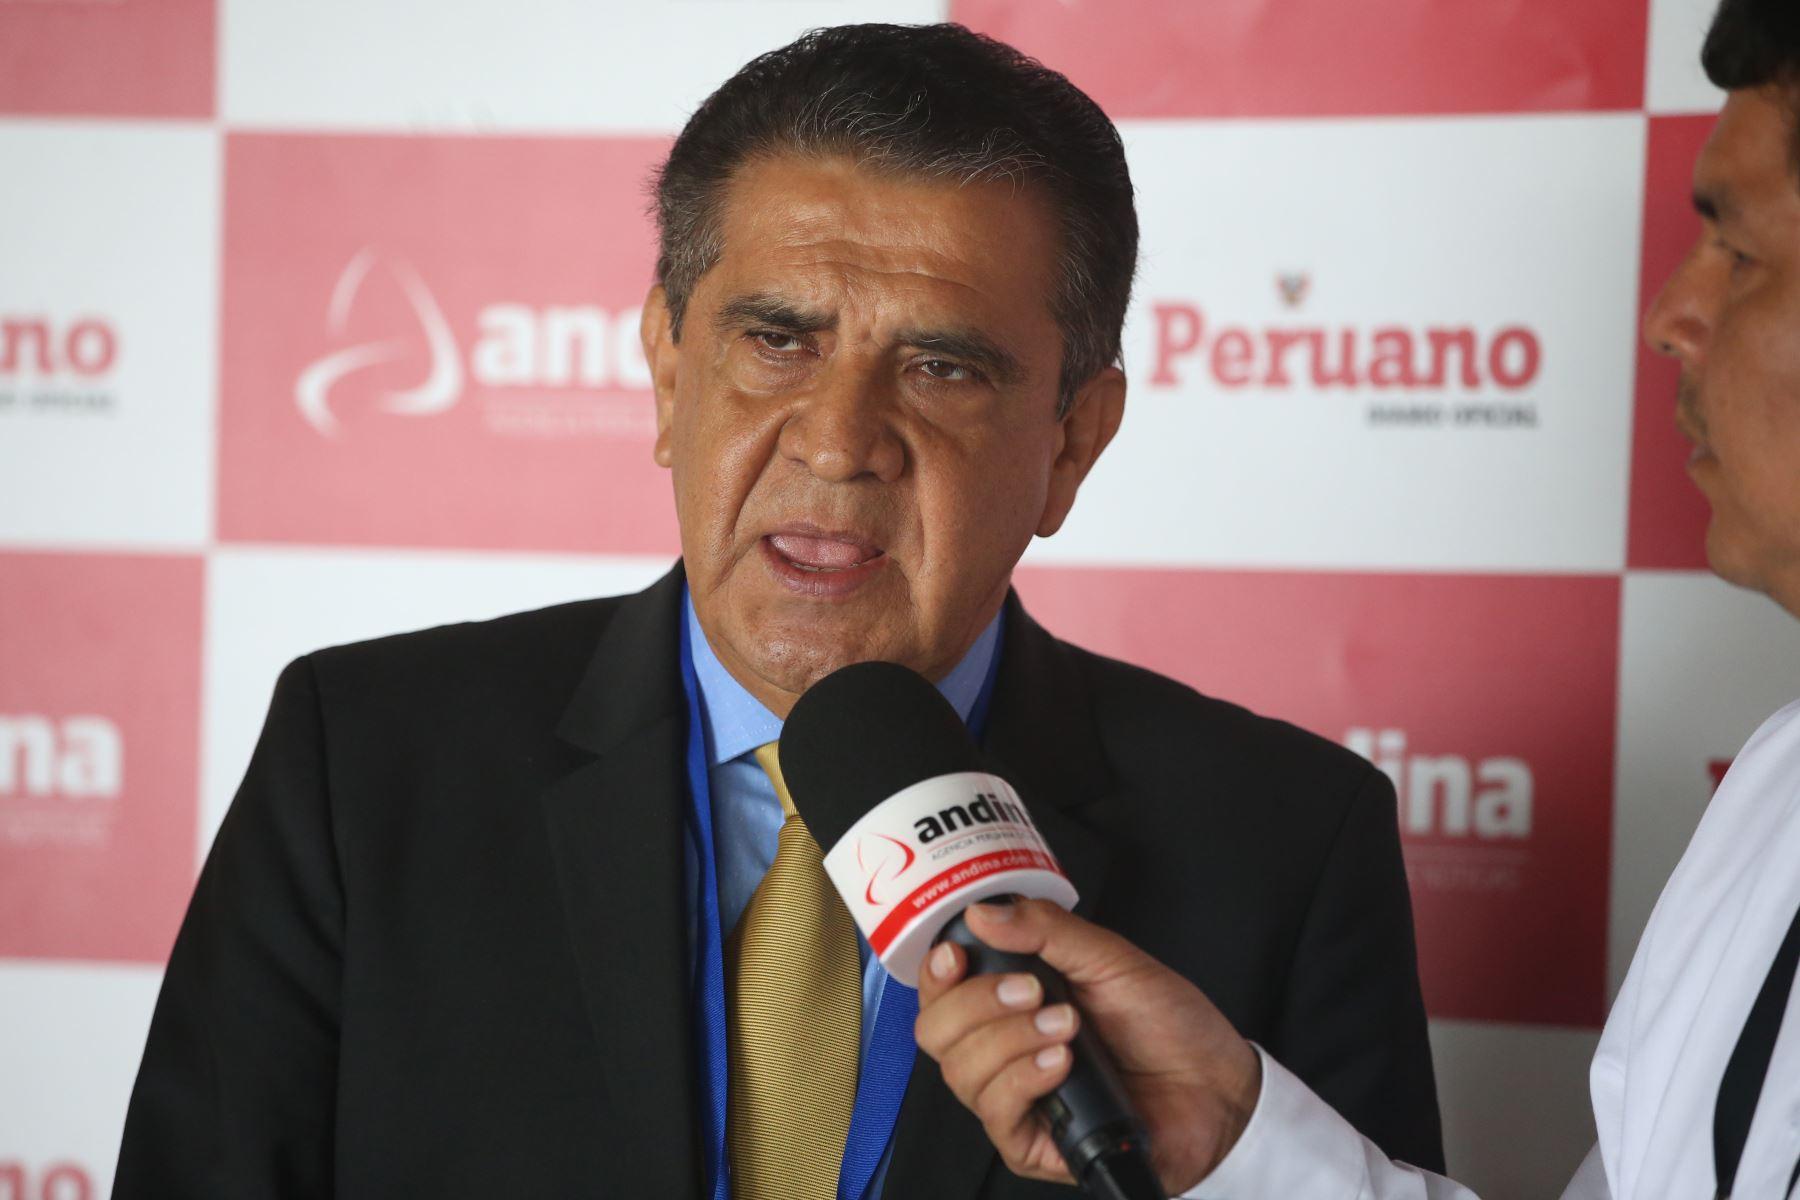 Segunda Reforma Agraria privilegiará agricultura familiar afirma gobernador de La Libertad